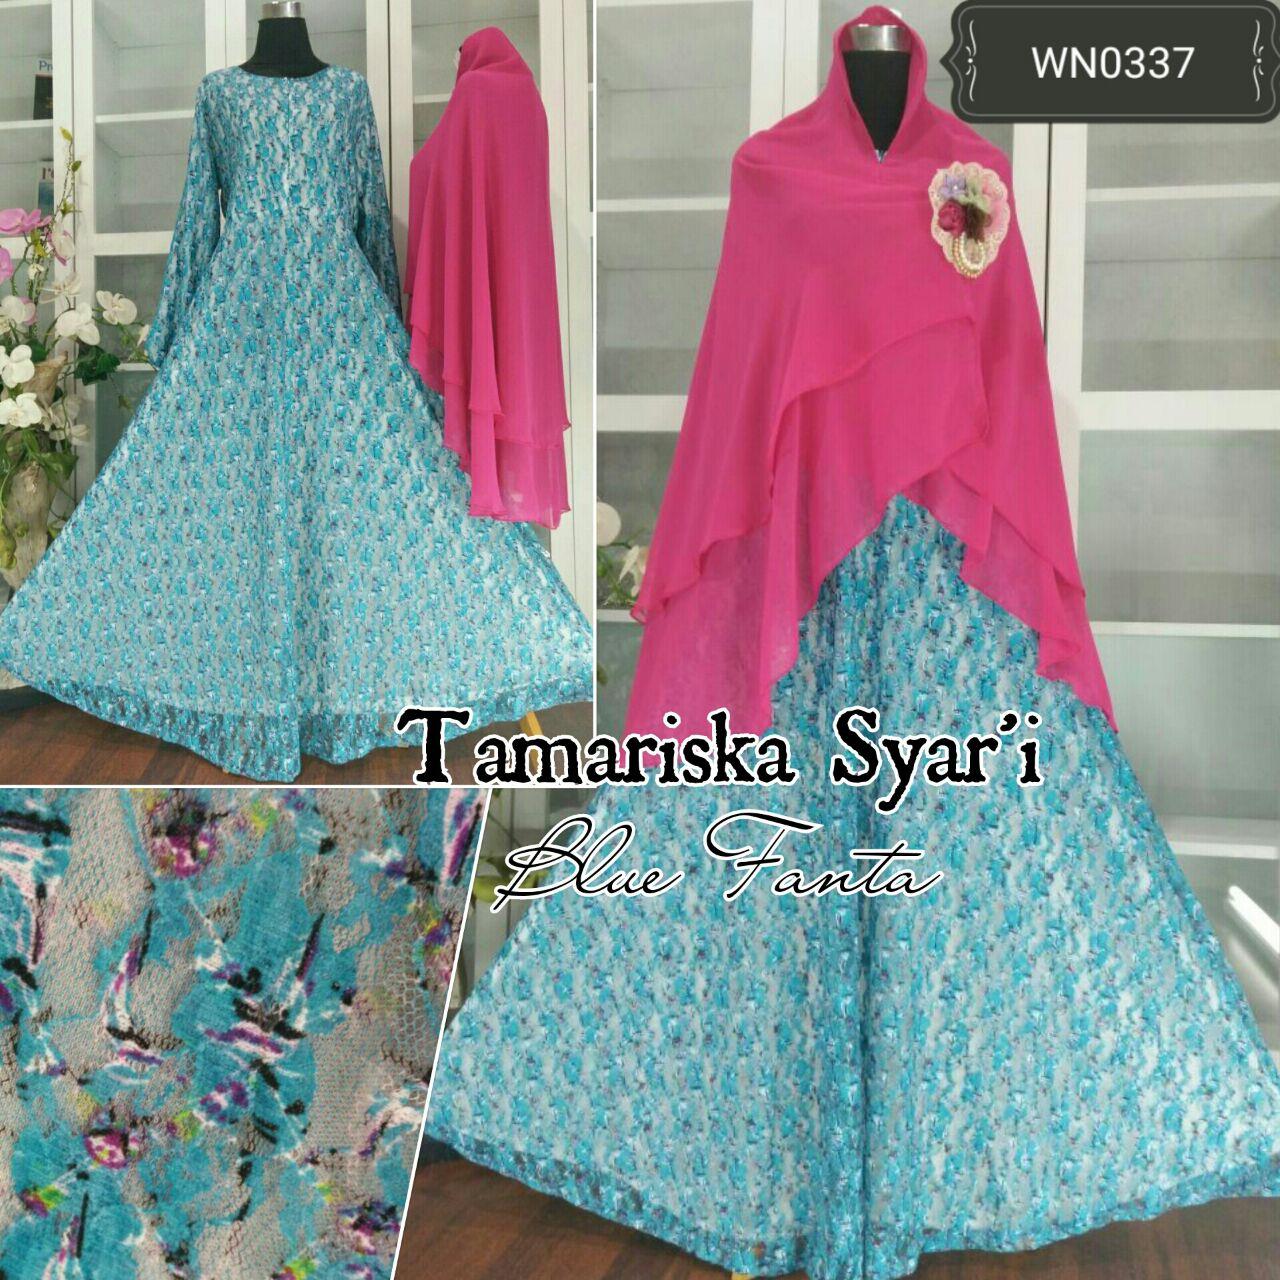 Ayuatariolshop Distributor Supplier Gamis Tangan Pertama Onlineshop Just Mom Baju Menyusui Lyra 101 Light Blue Flower Tamariska Syari Bruklat Muslim Hijabers